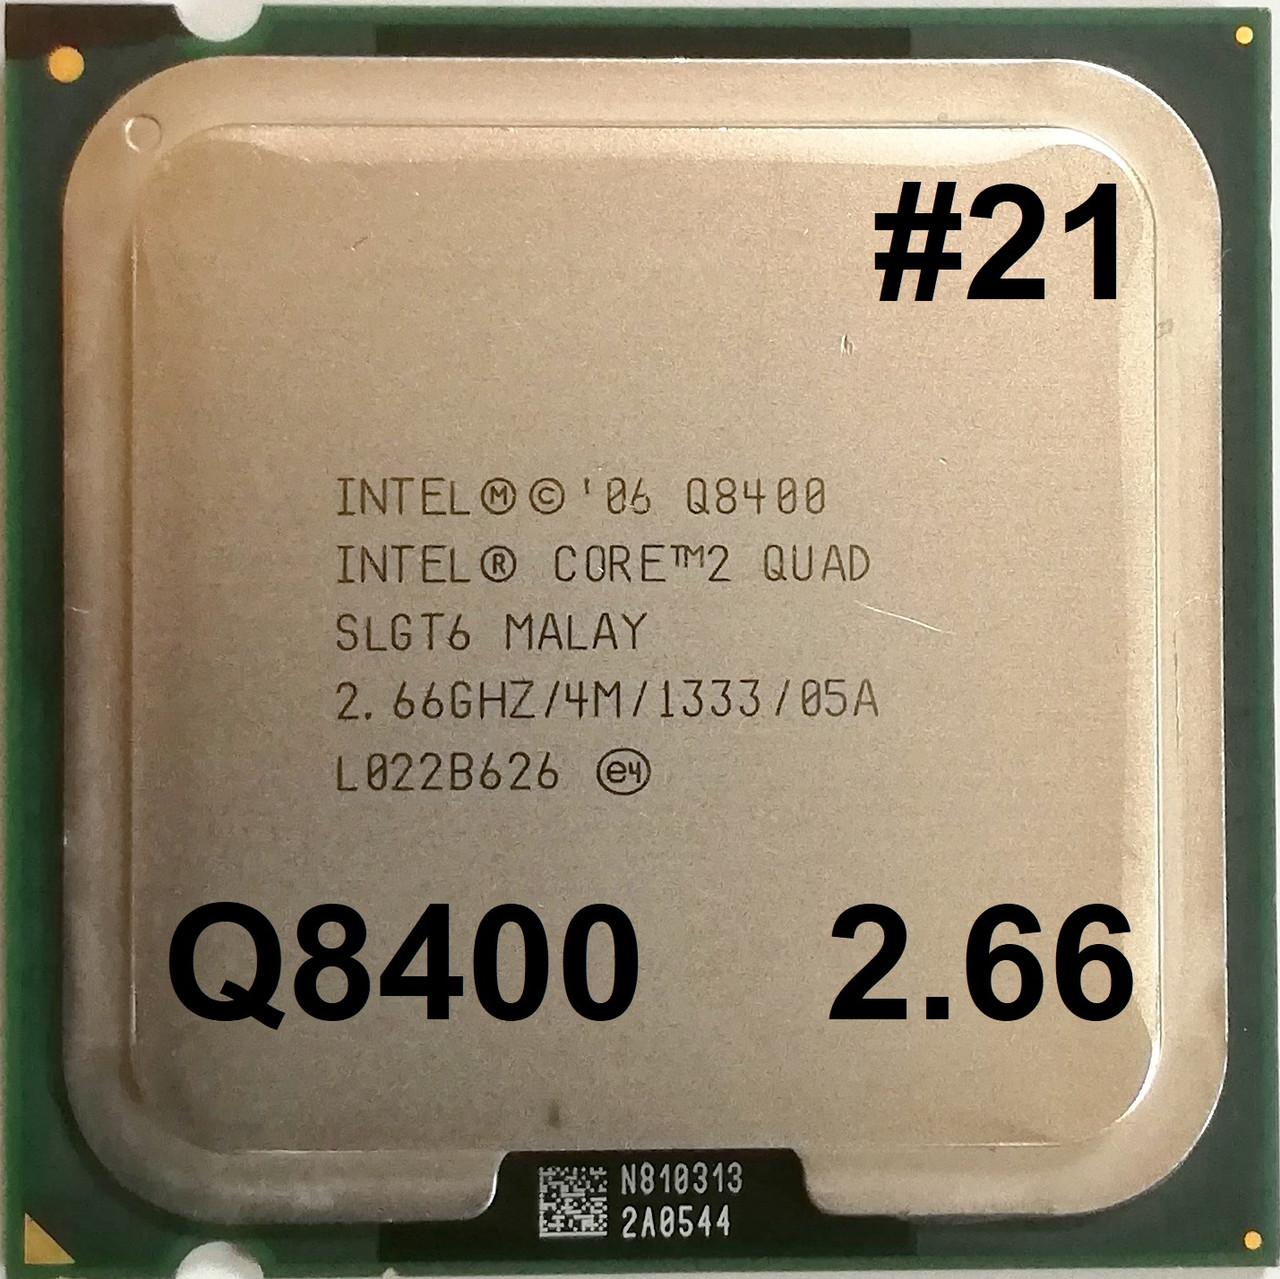 Процессор ЛОТ#21 Intel Core 2 Quad Q8400 R0 SLGT6 2.66GHz 4M Cache 1333 MHz FSB Soket 775 Б/У